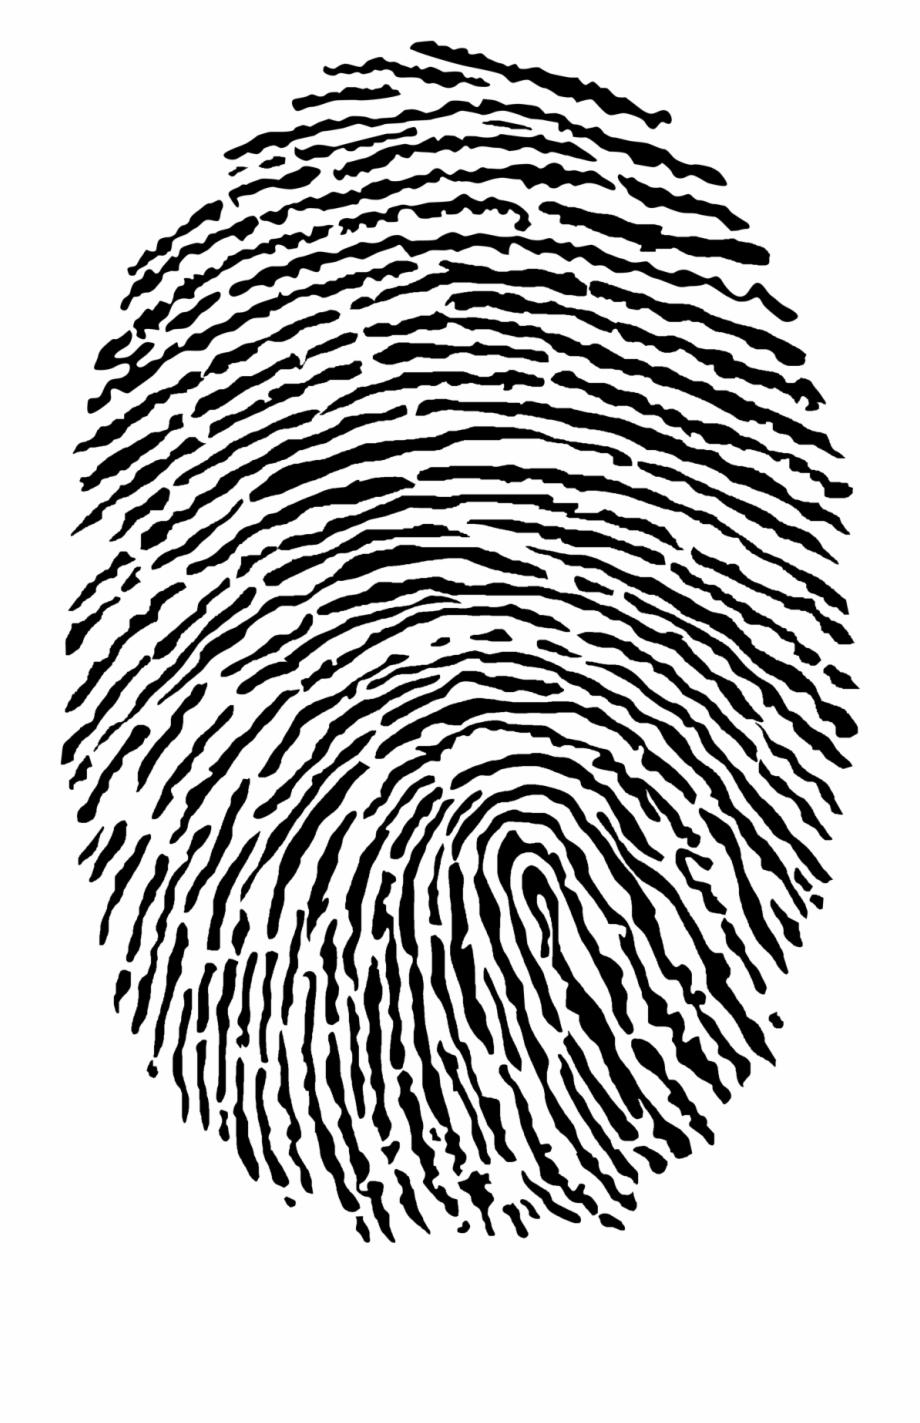 Fingerprint Png.